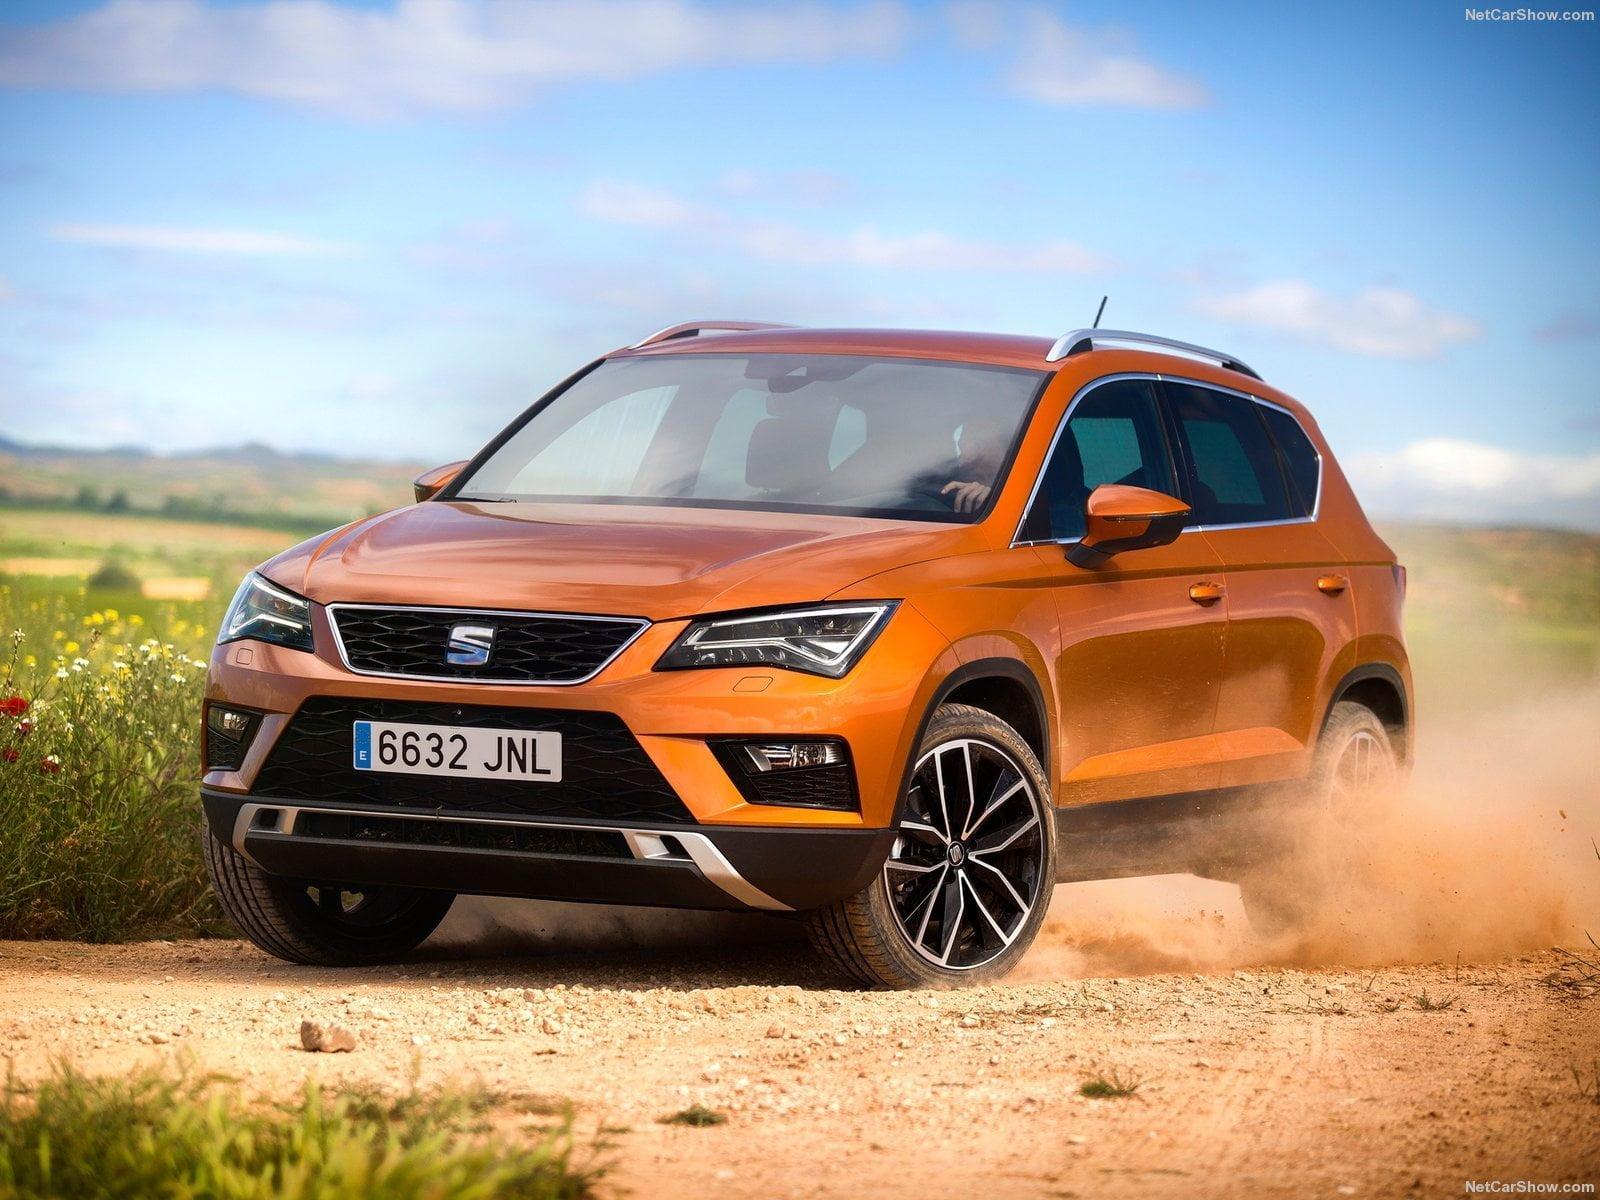 Spain auto market